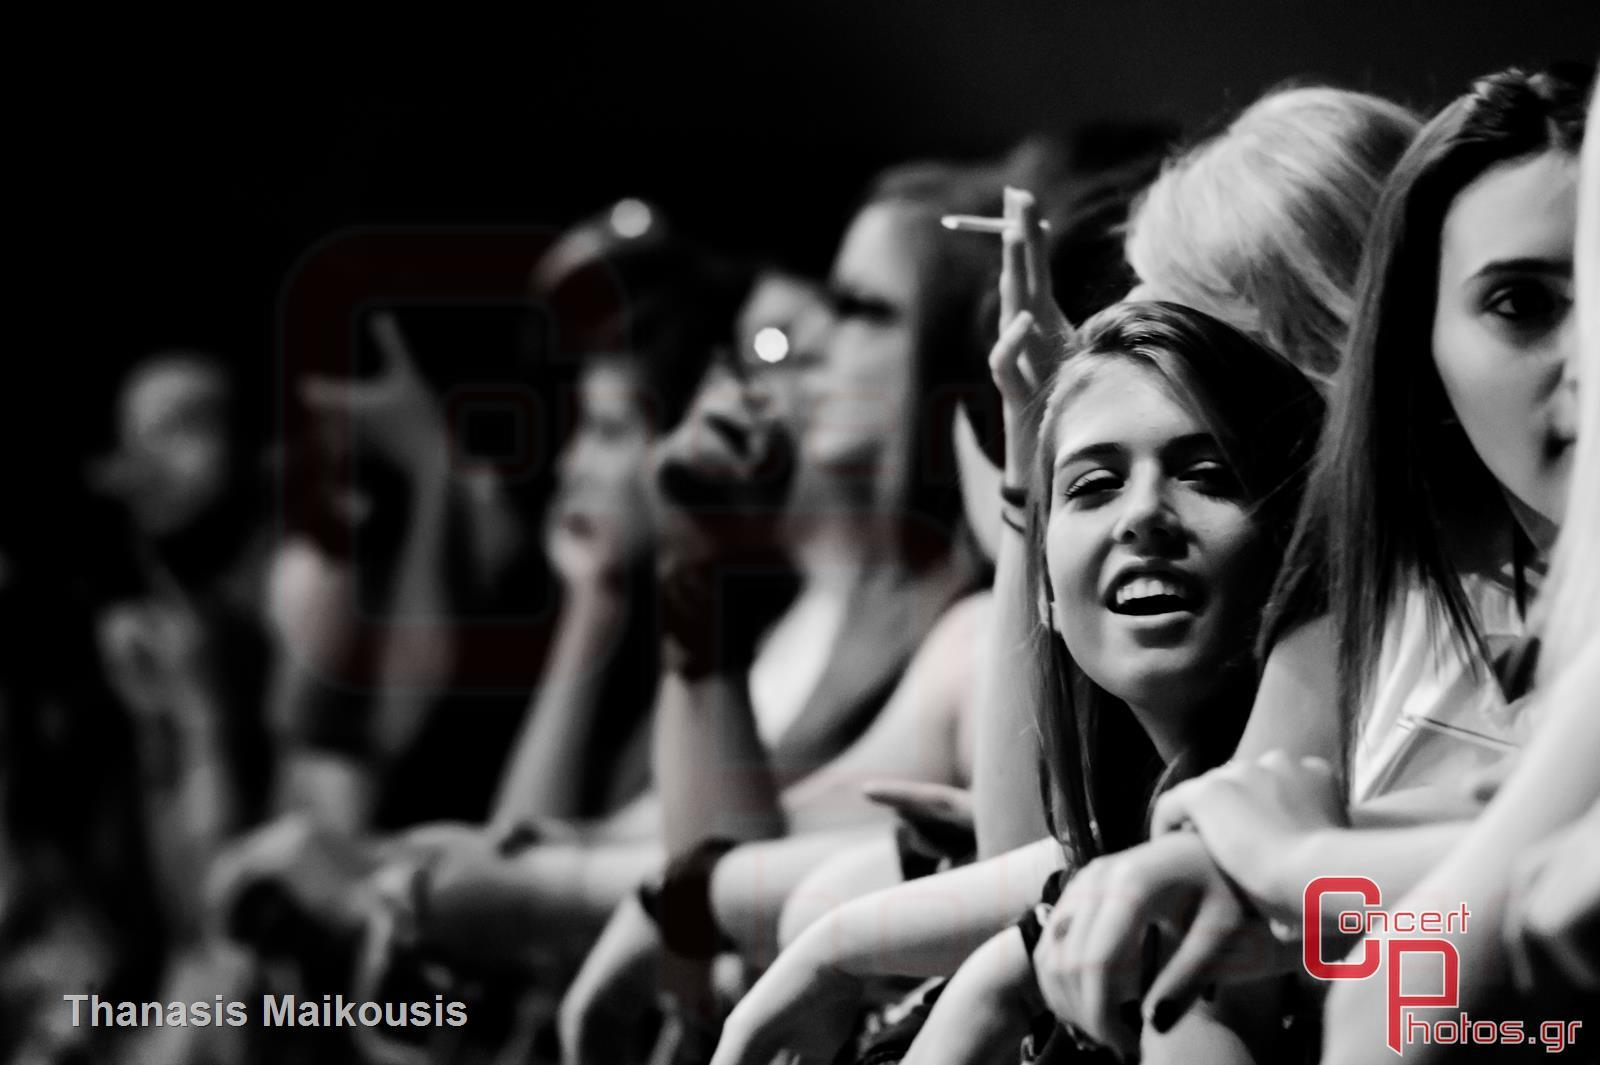 Active Member - Τραγούδα μας να φύγει το σκοτάδι- photographer: Thanasis Maikousis - concertphotos_-5409